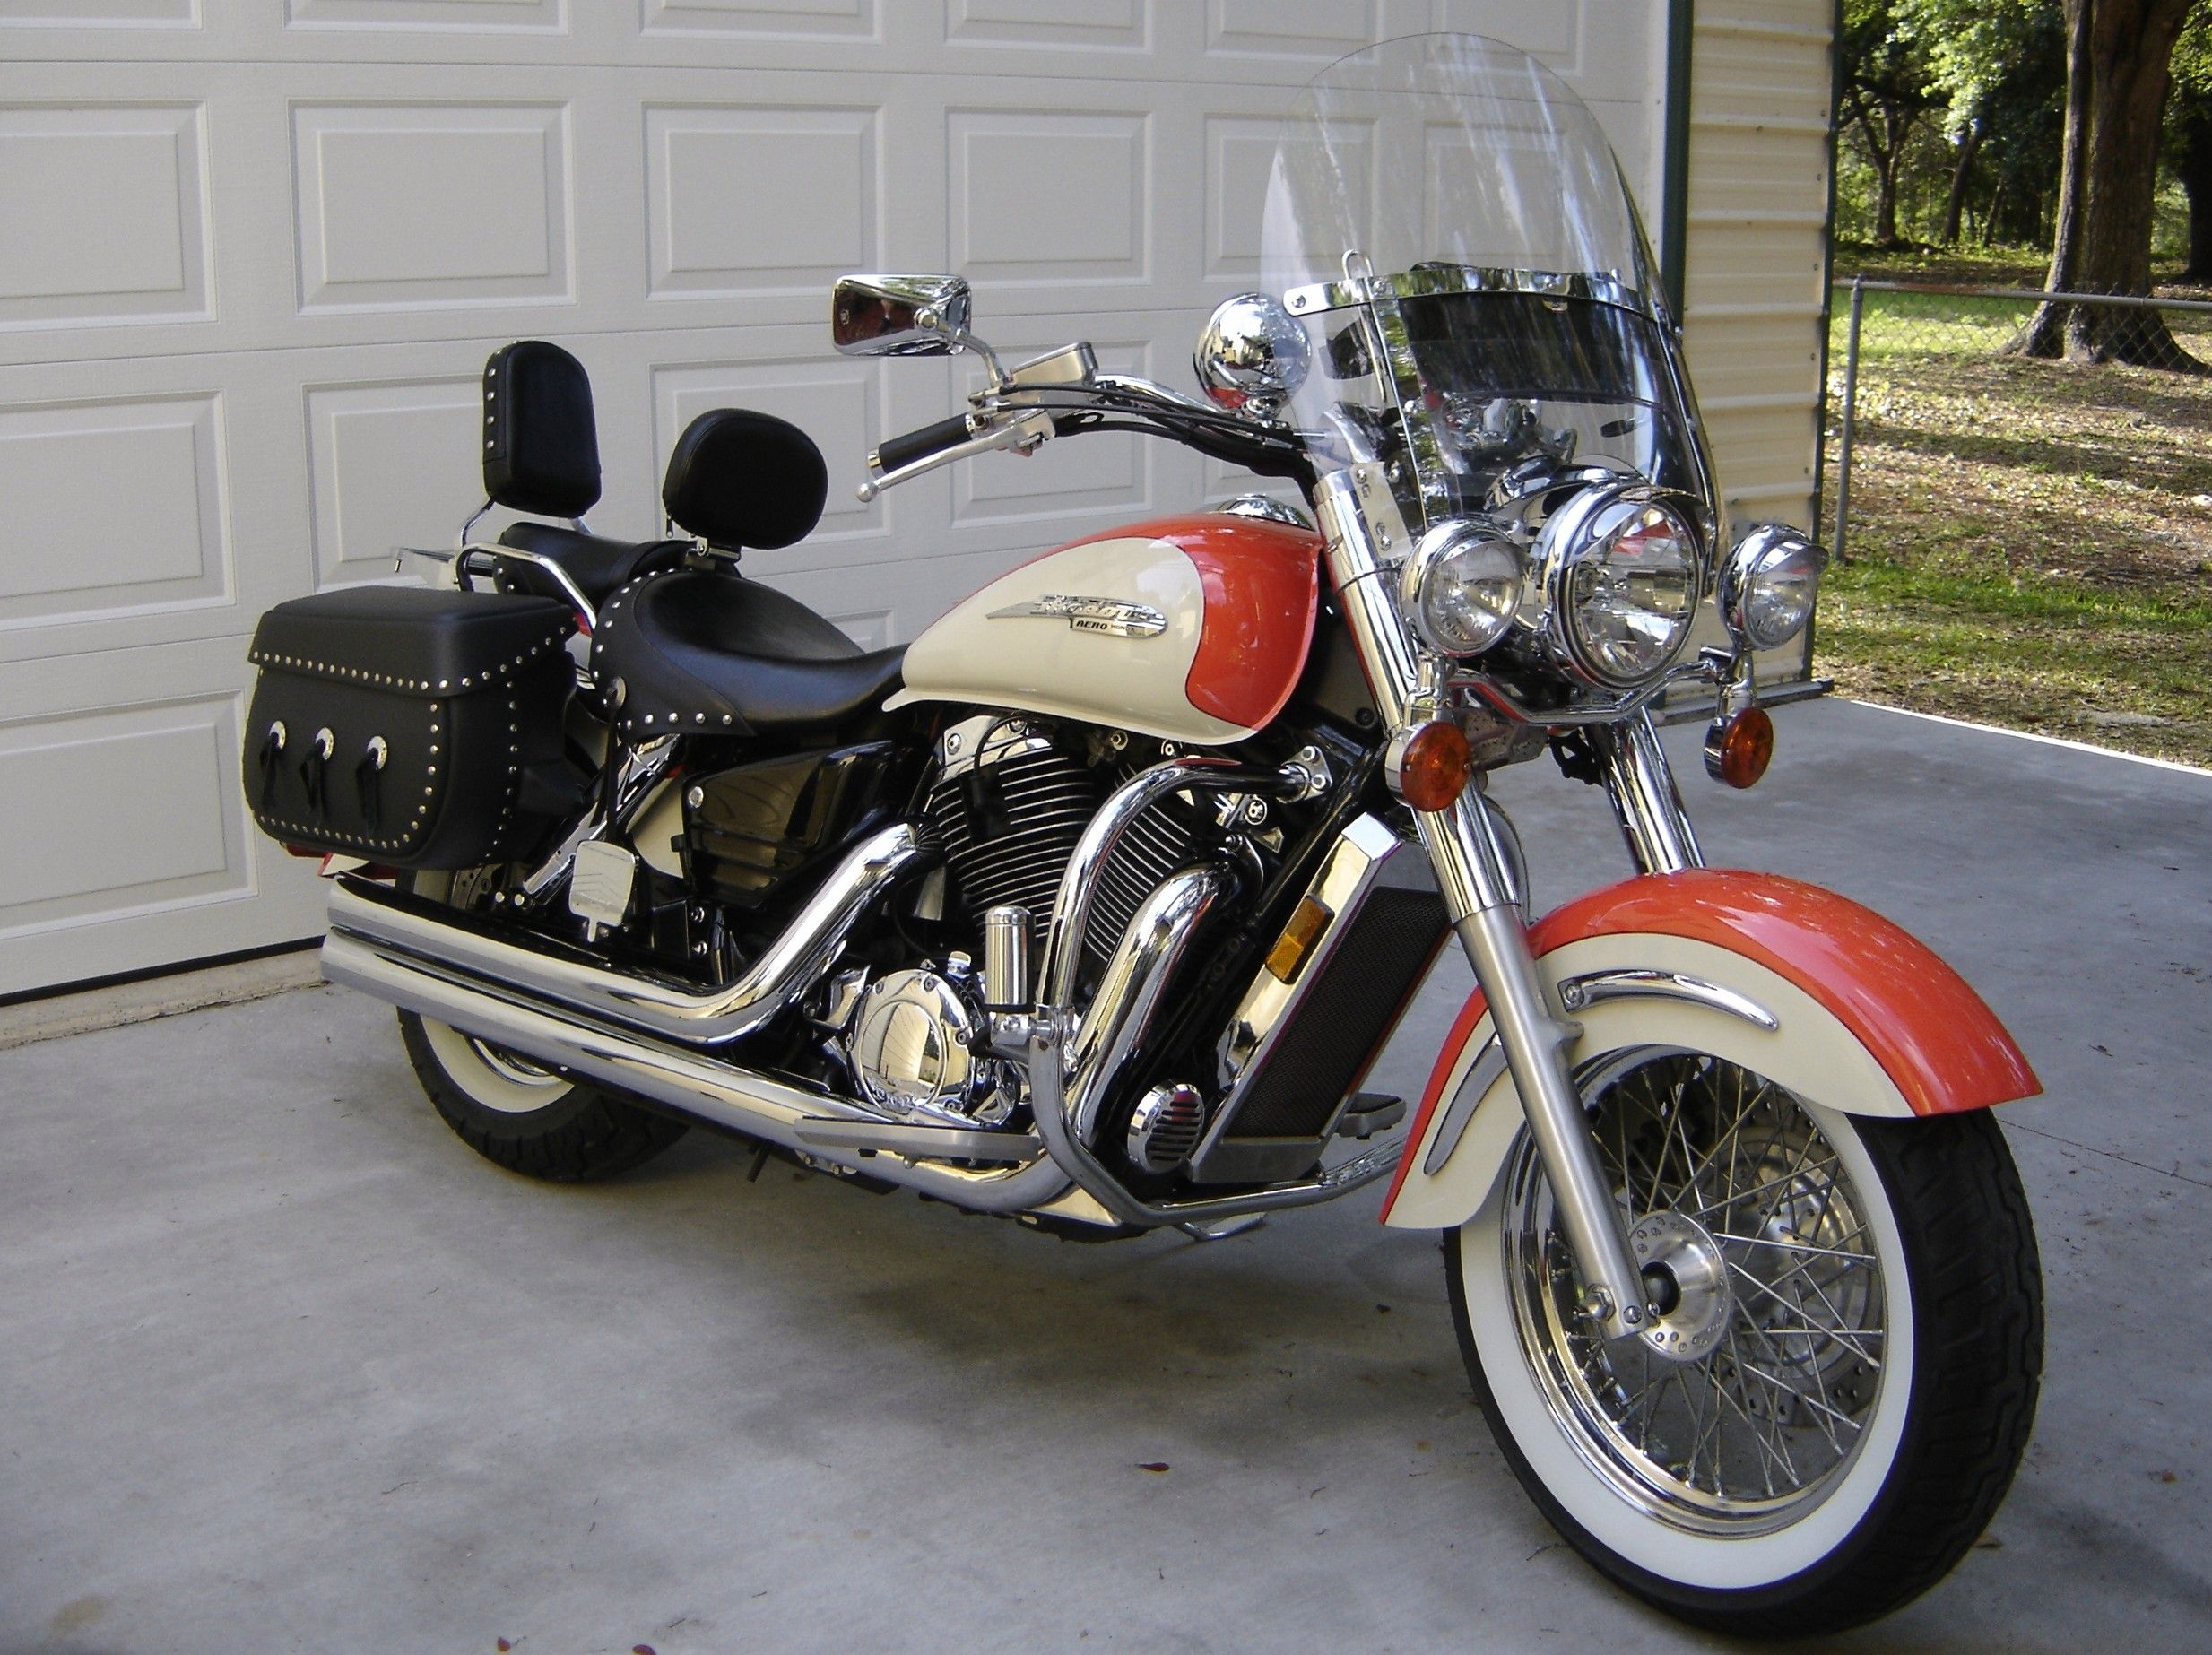 My ride 1999 honda shadow aero 1100